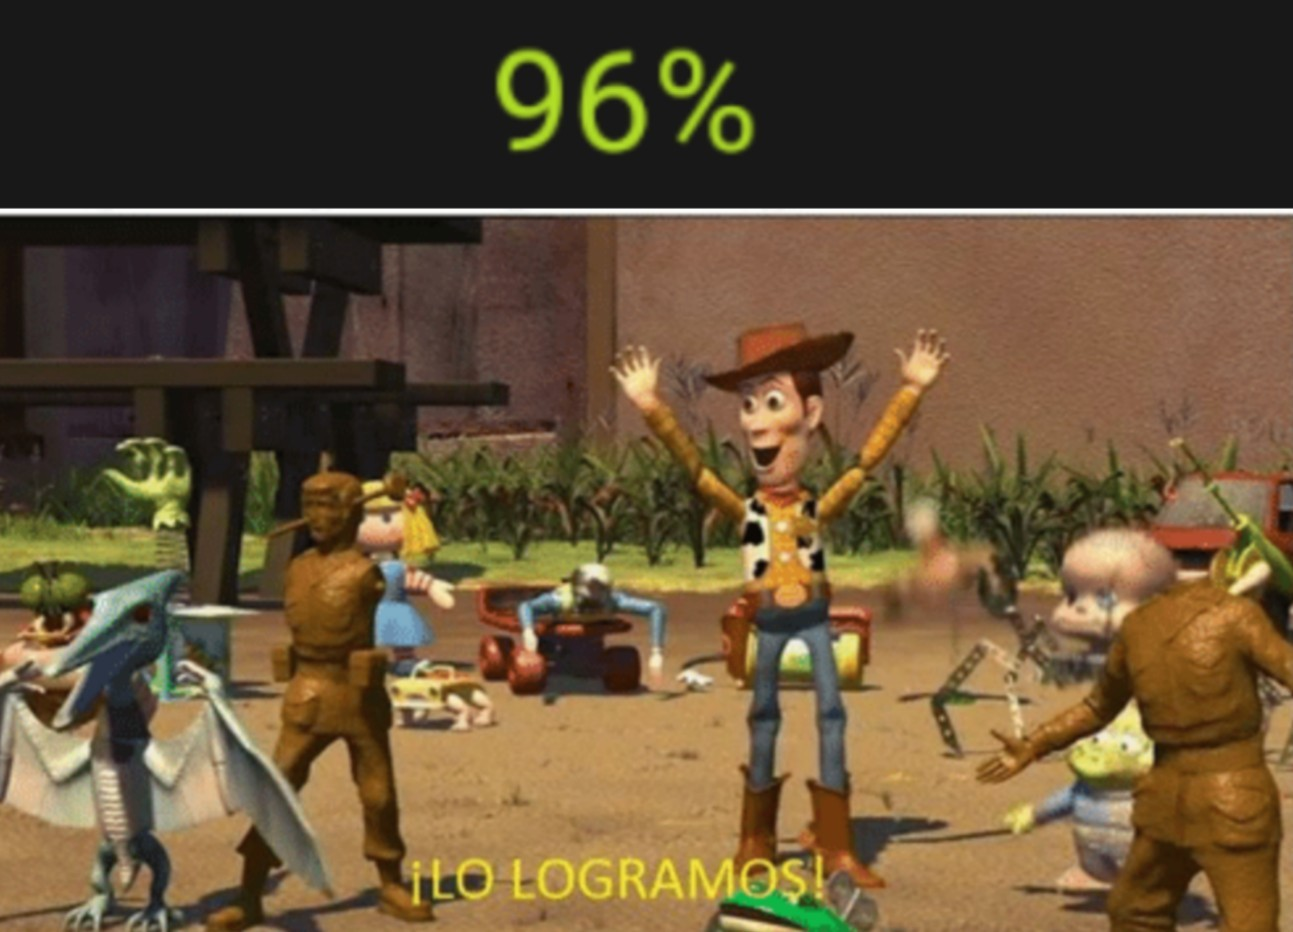 96% - meme